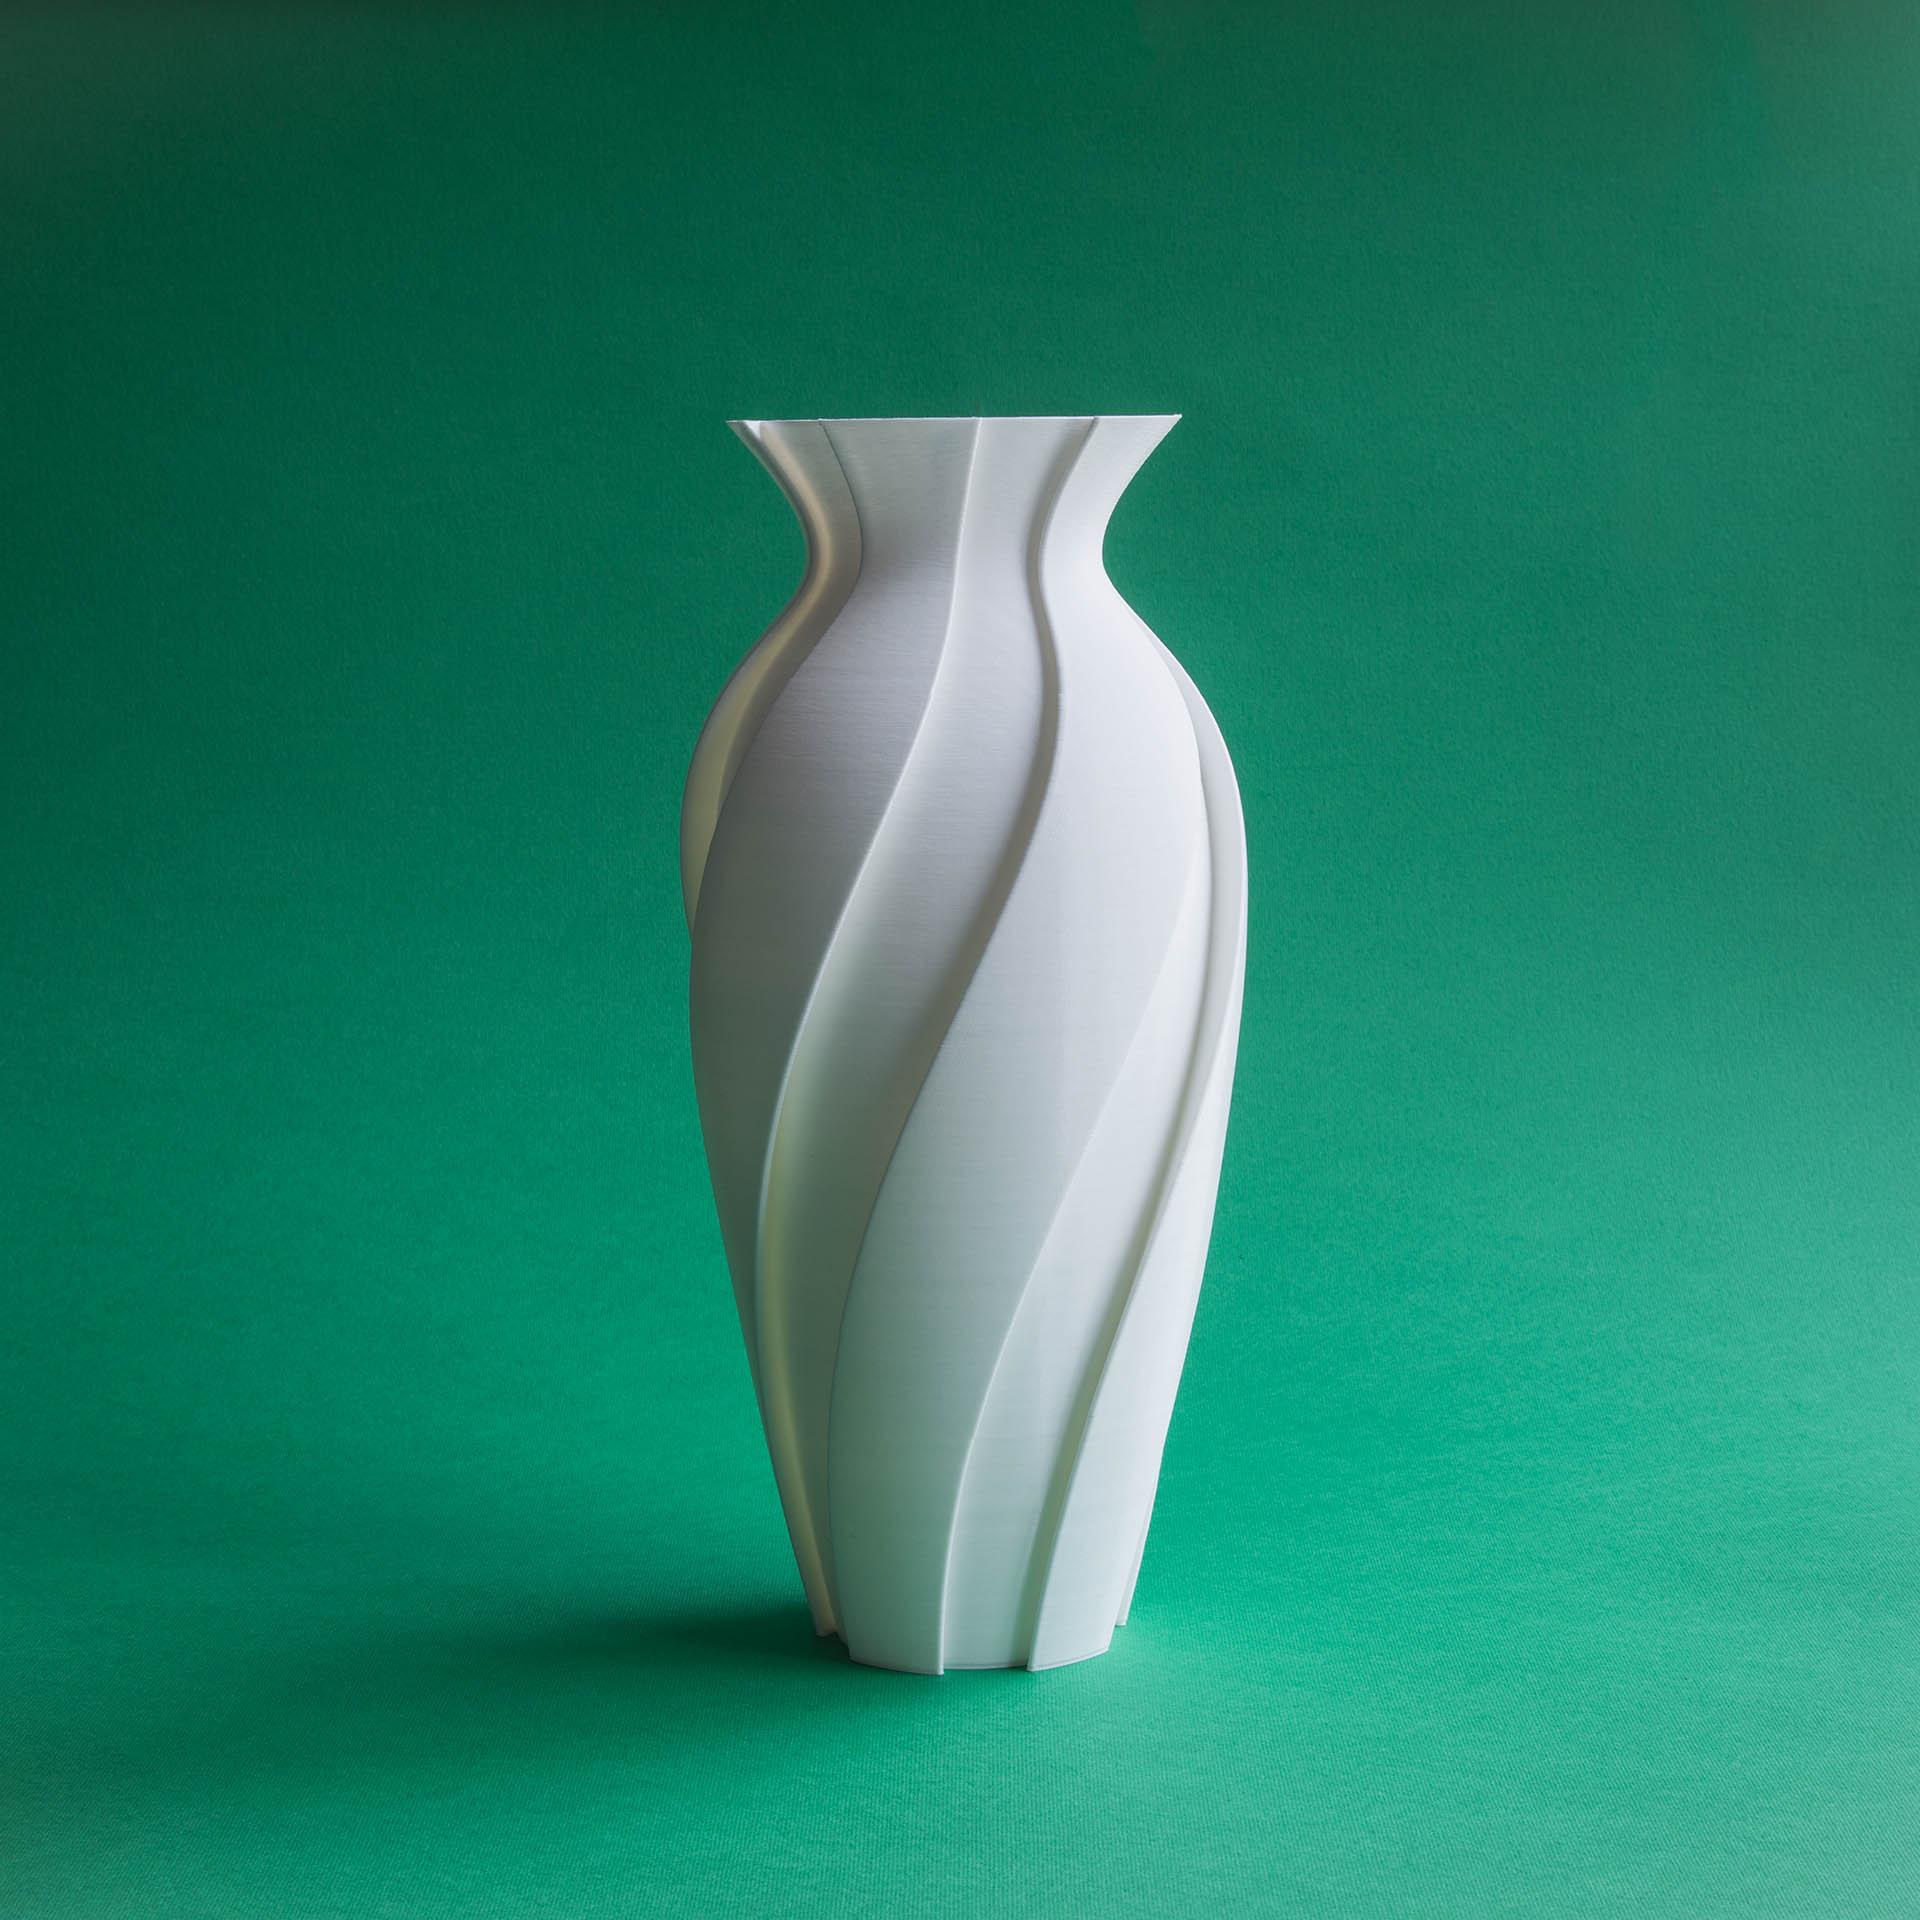 Vásame Hydria, , Adriano Alfaro, vaso stampato 3D